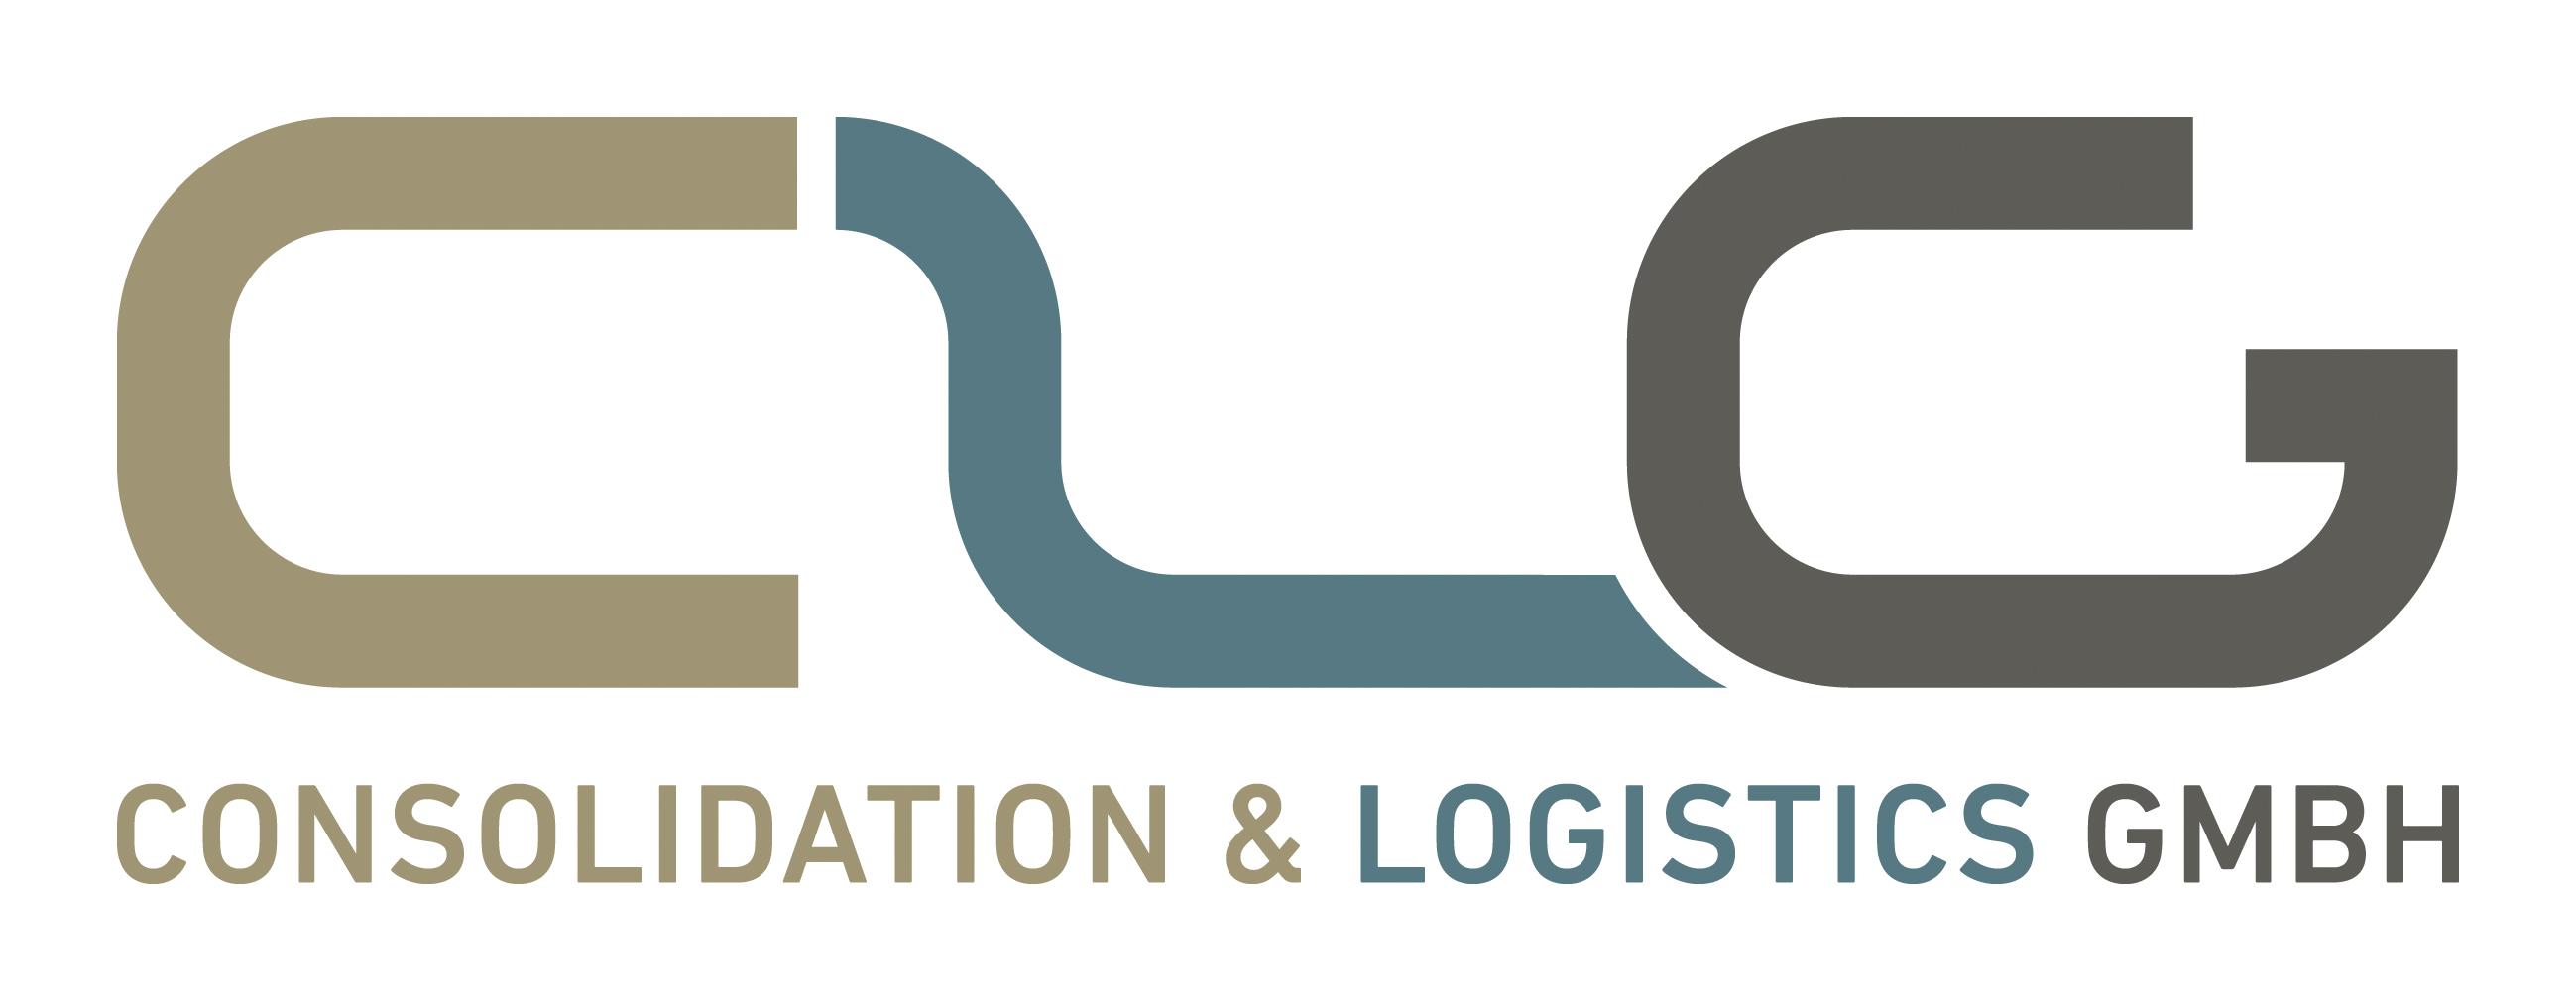 CLG Consolidation & Logistics GmbH